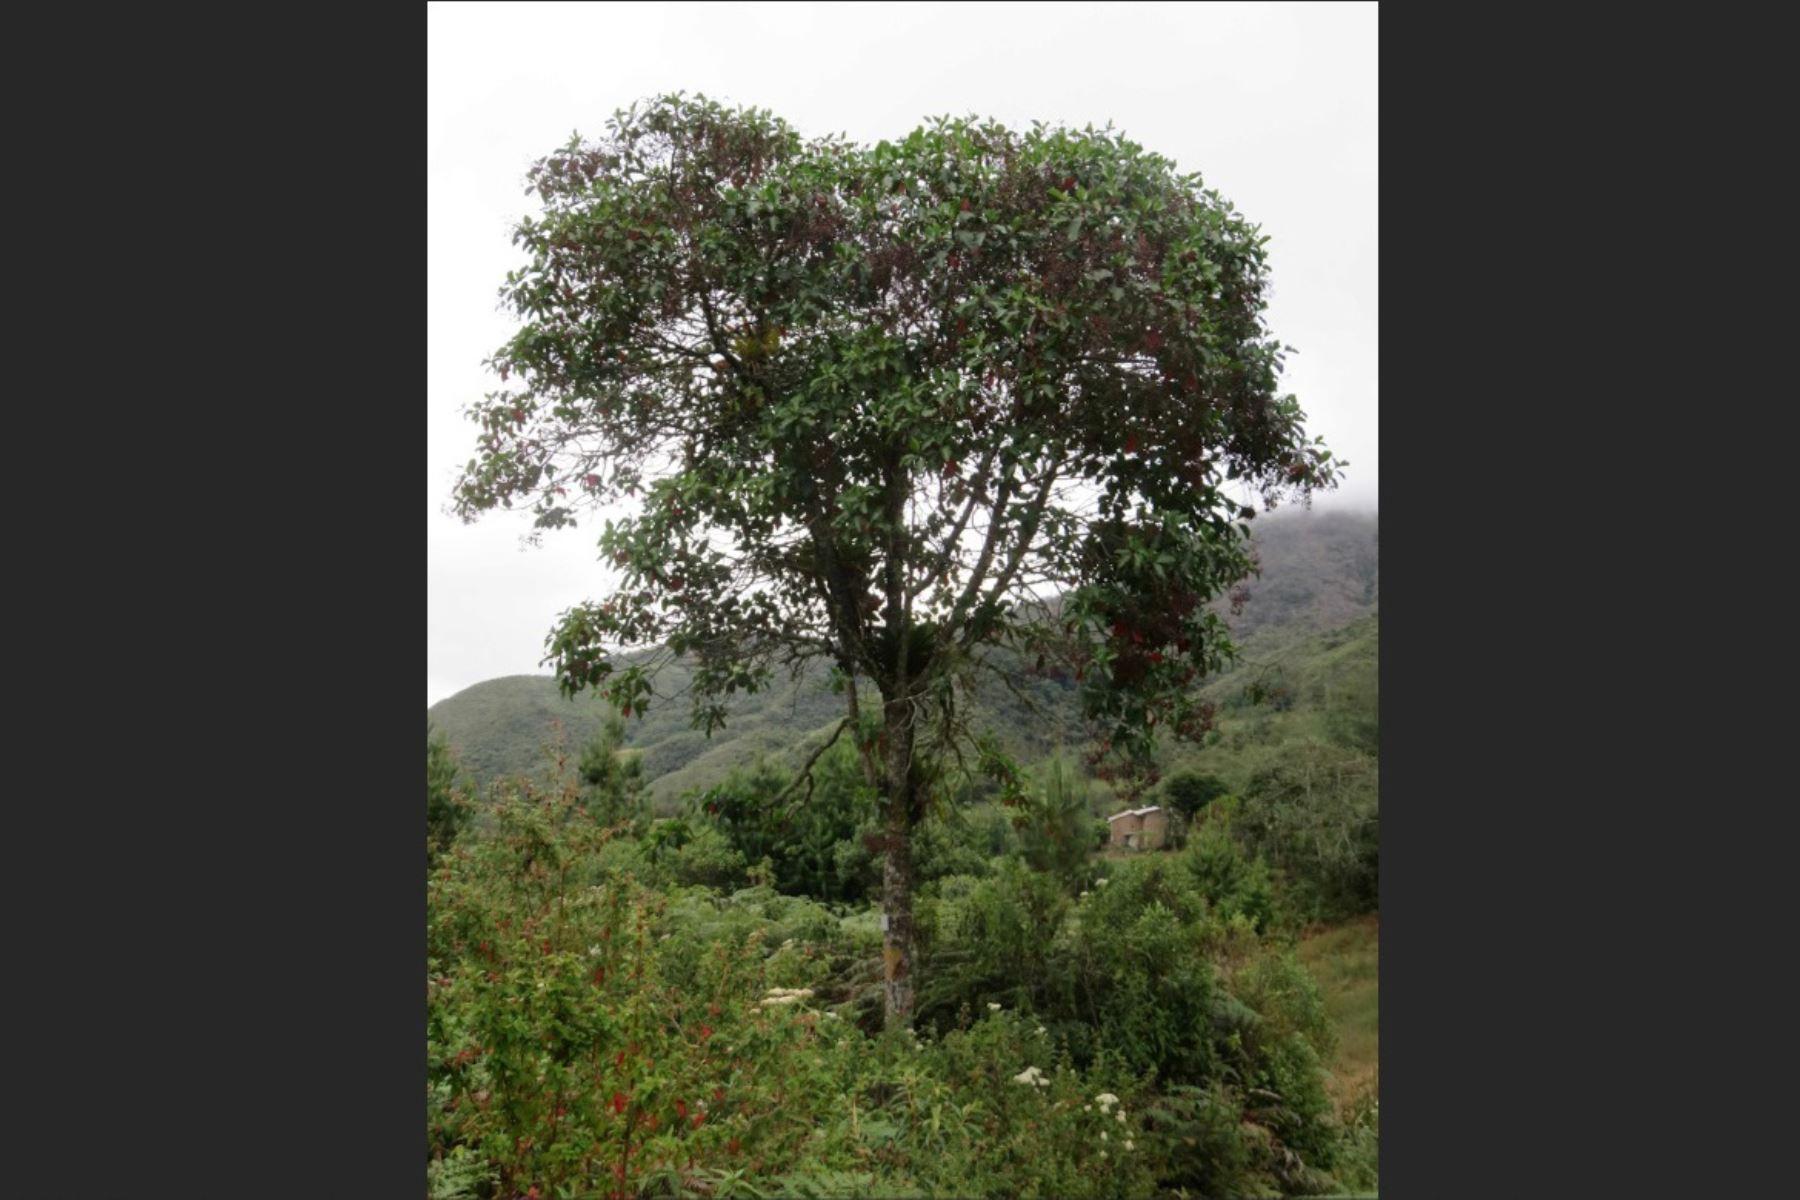 La quina, el árbol nacional de Perú libra batalla para sobrevivir. AFP